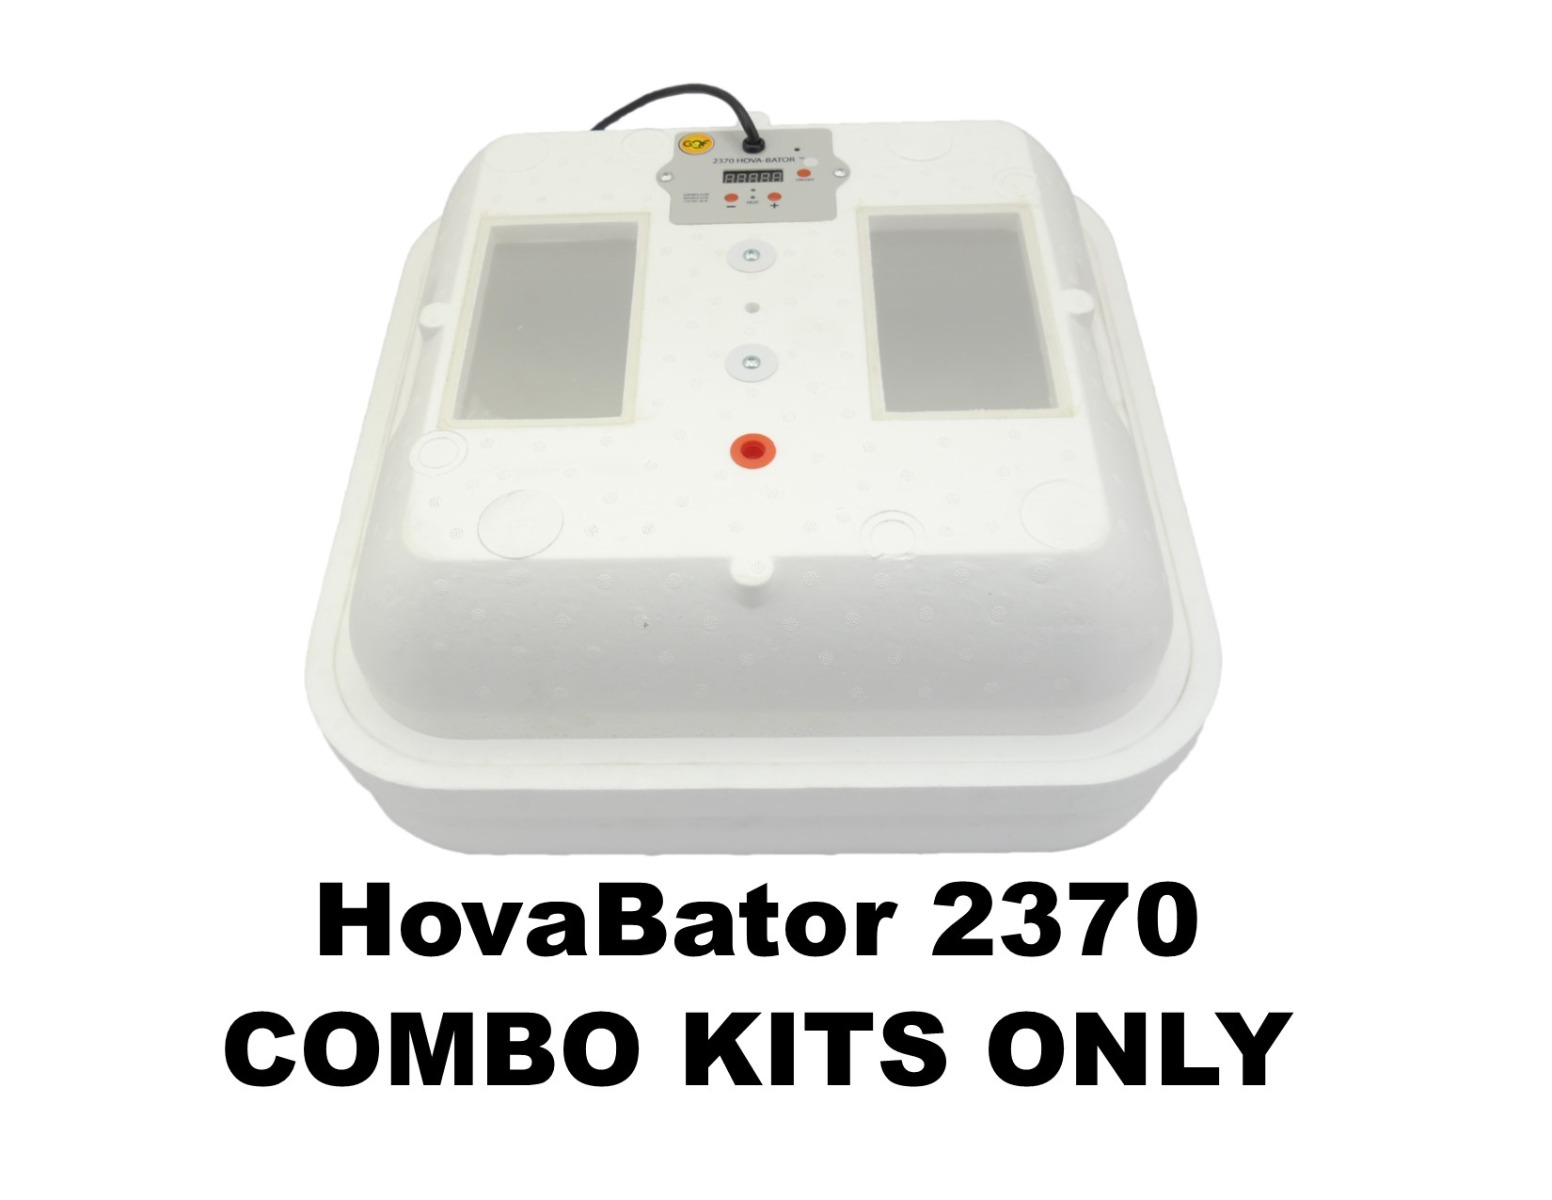 HovaBator 2370 Combo Kits